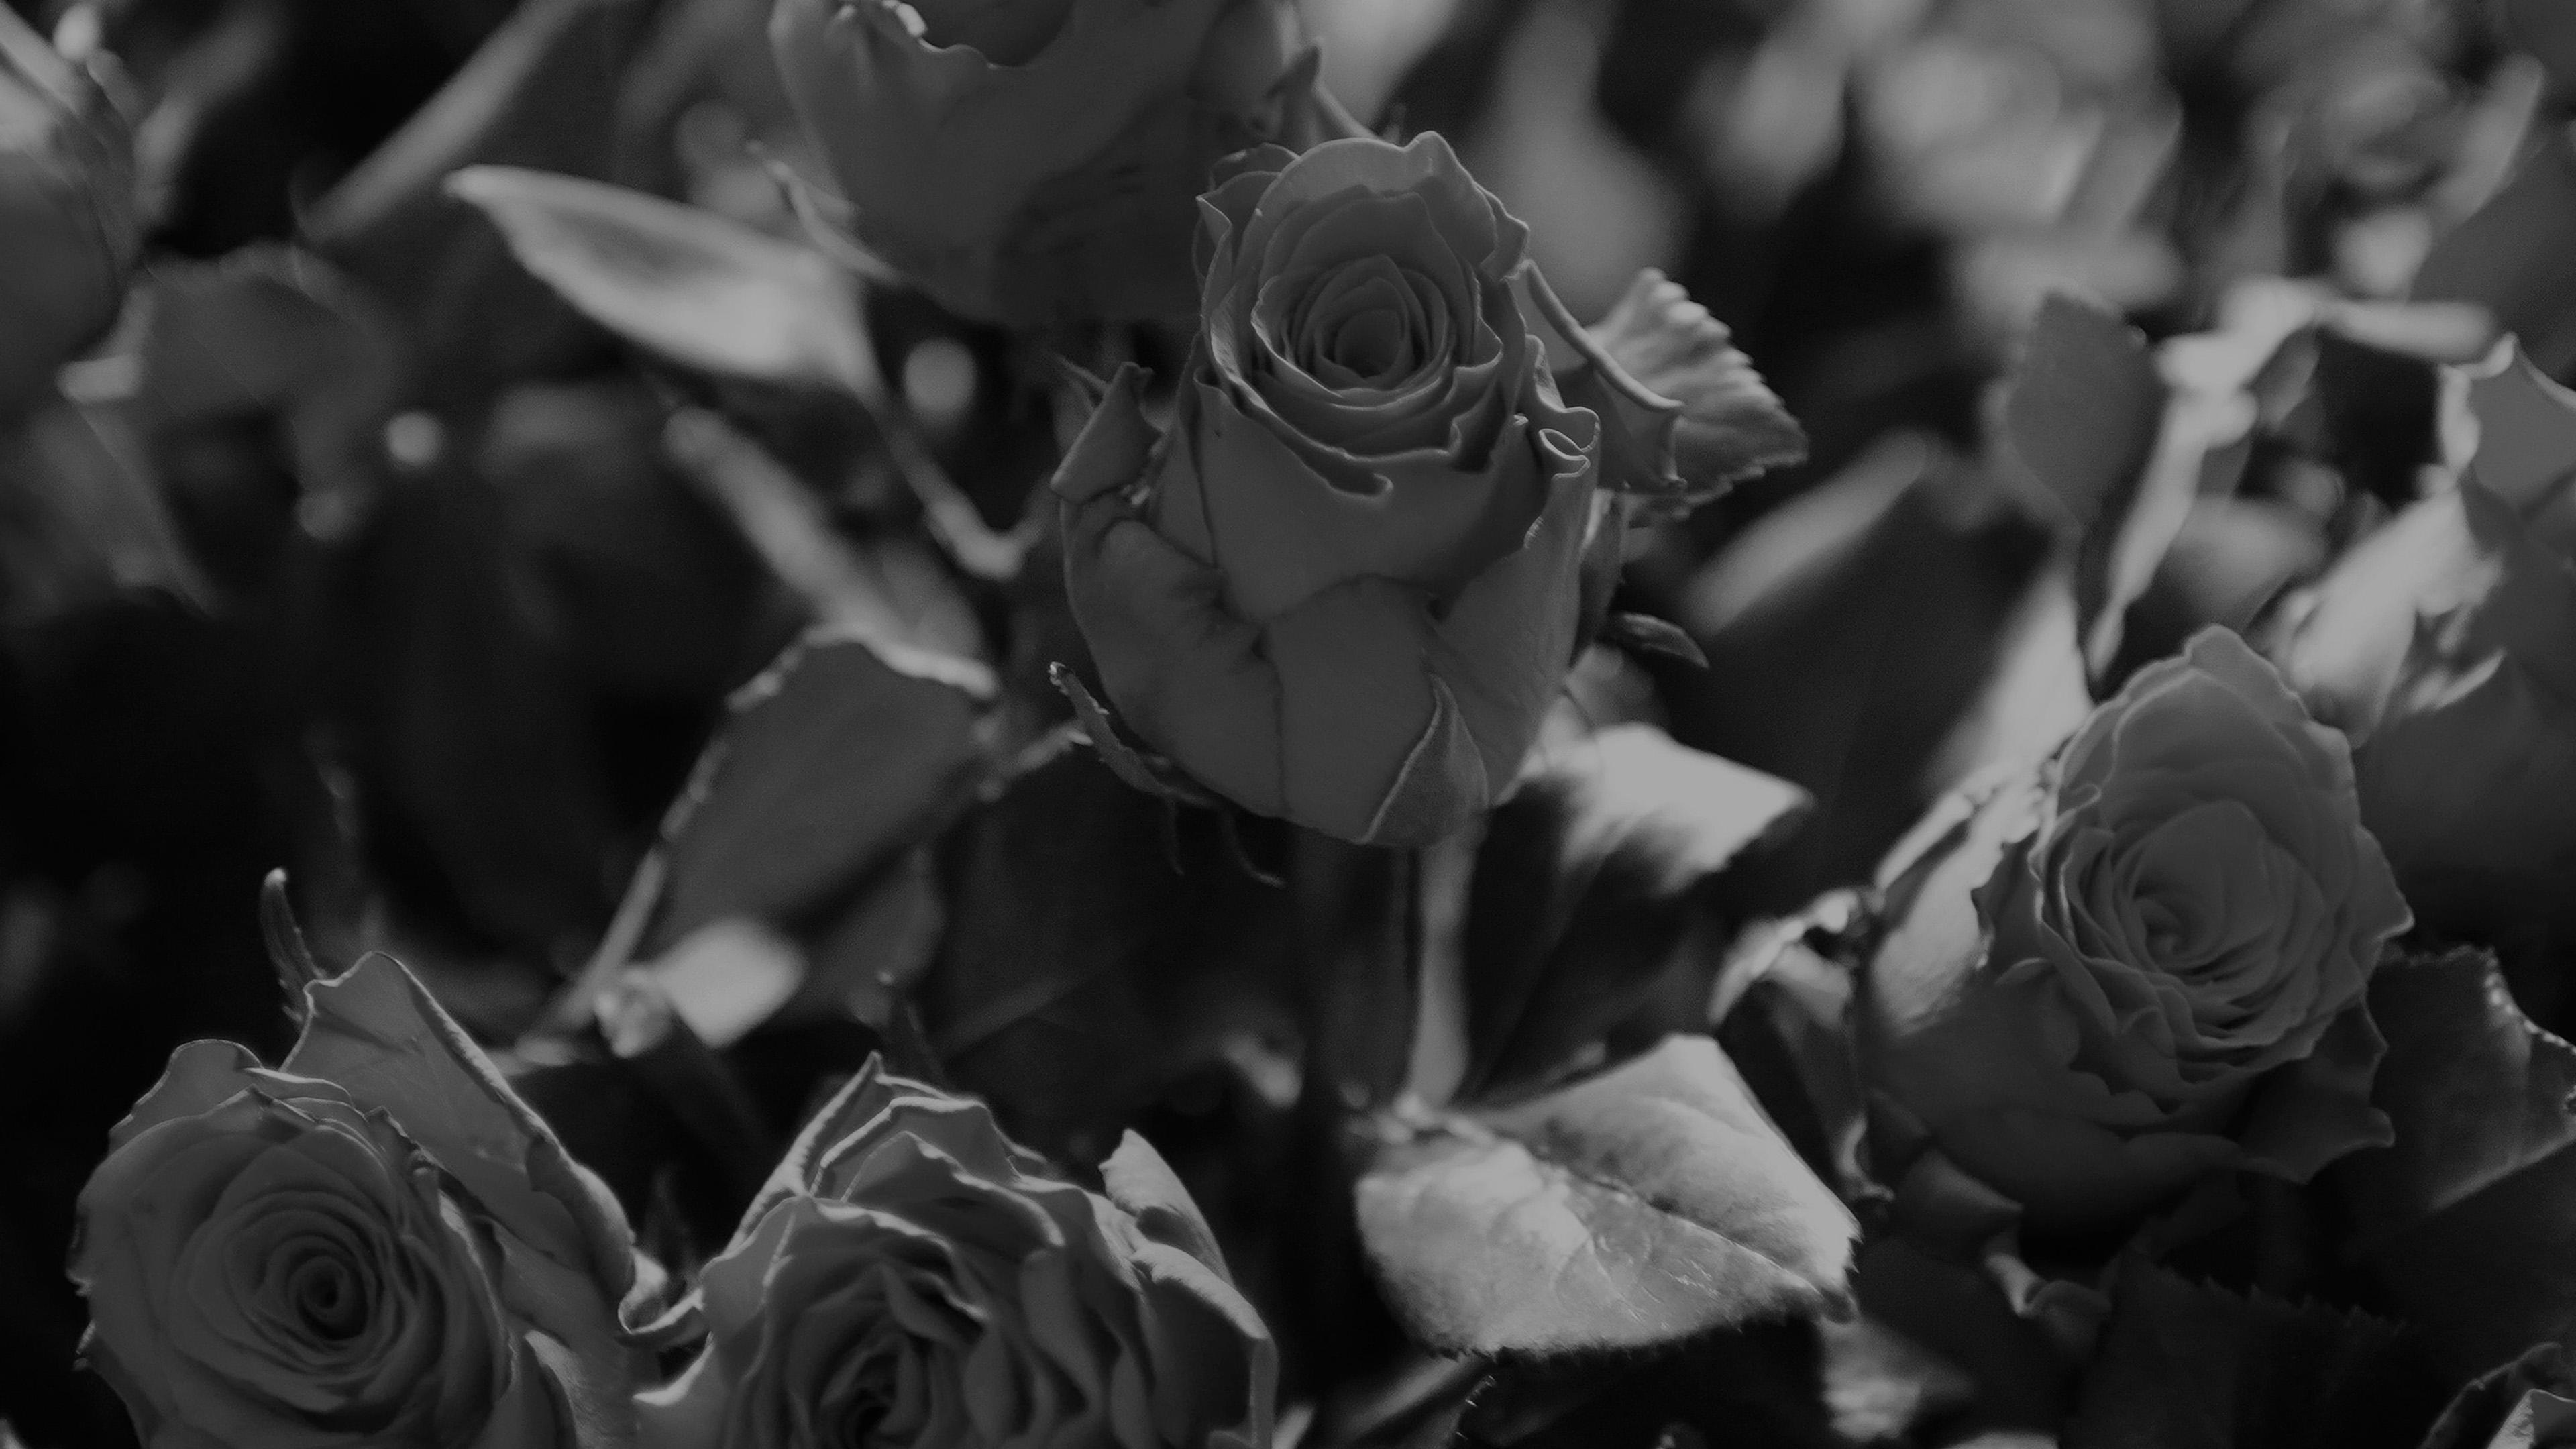 ms46-rose-flower-gift-red-nature-dark-bw-wallpaper